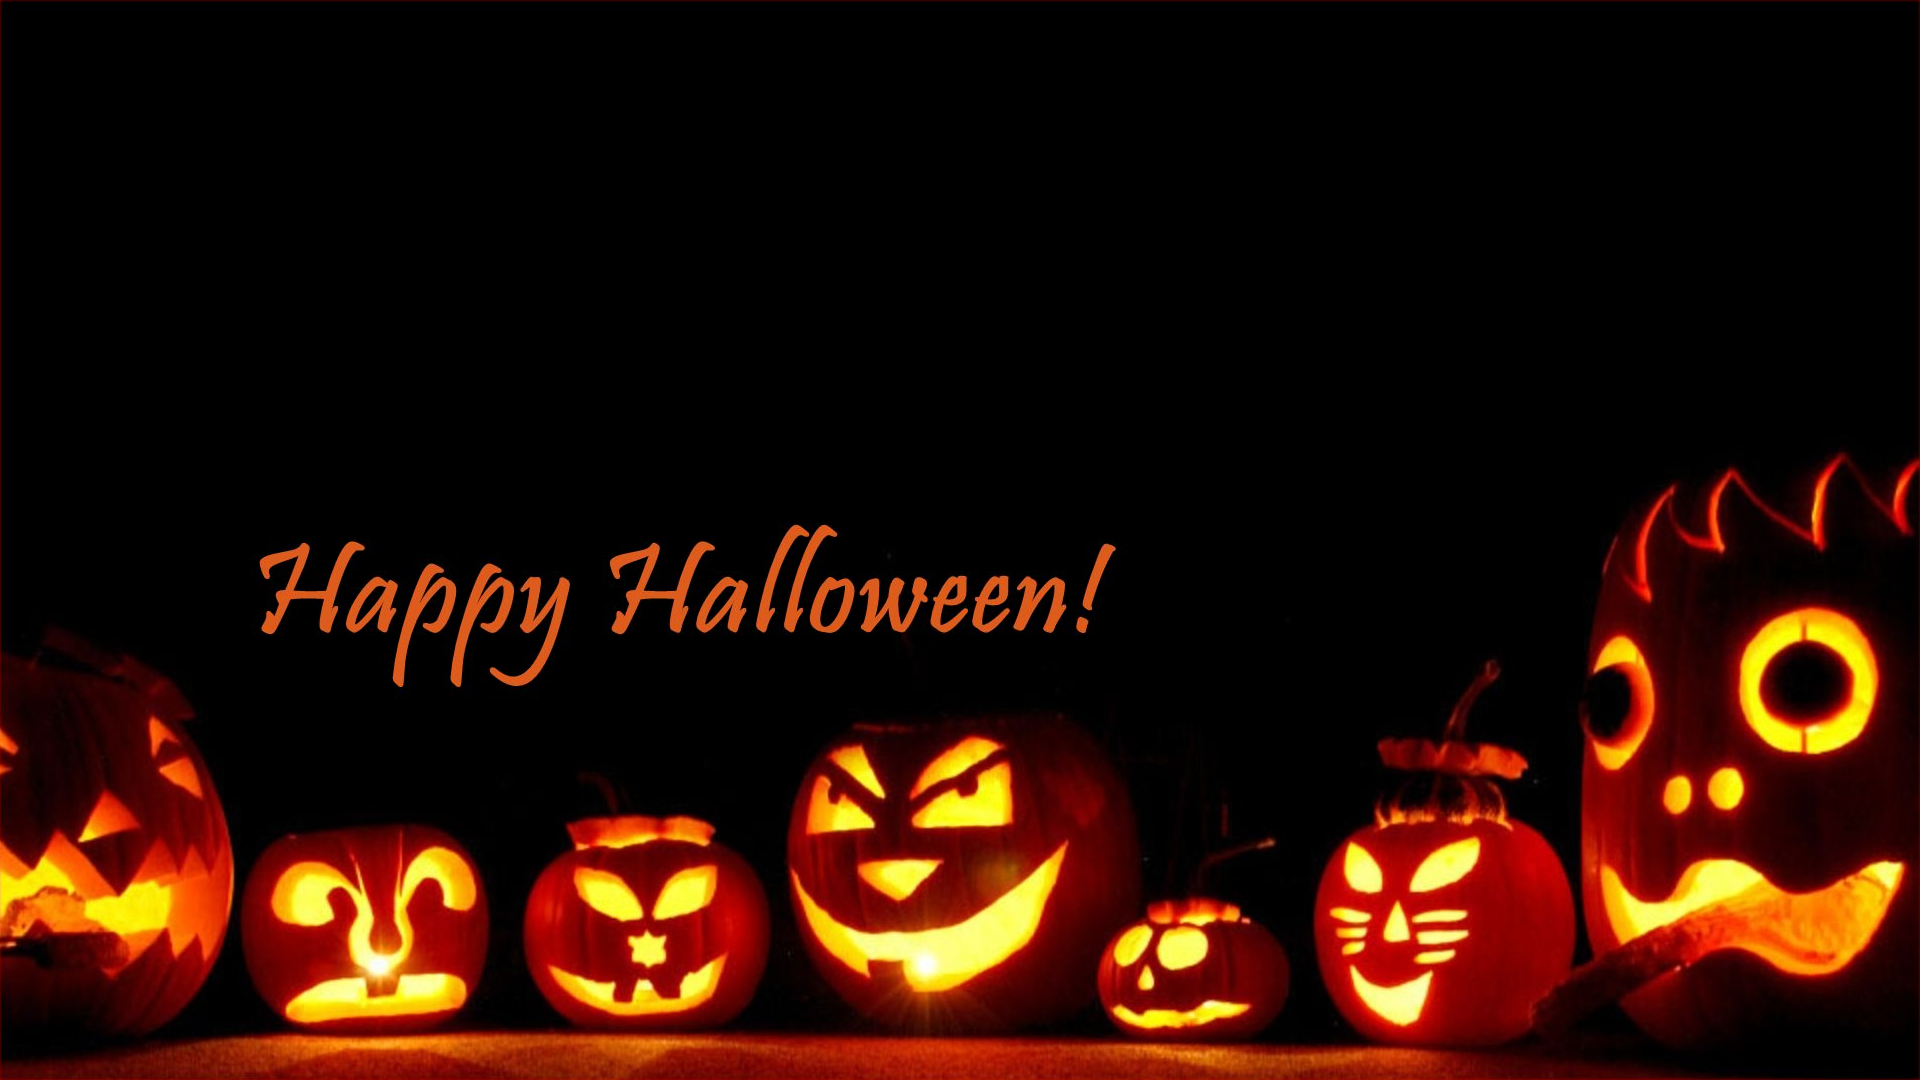 Jack O Lantern Wallpaper Here You Can See Very Interesting Holiday Pumpkin Wallpaper Jack O Lantern Halloween Pumpkins